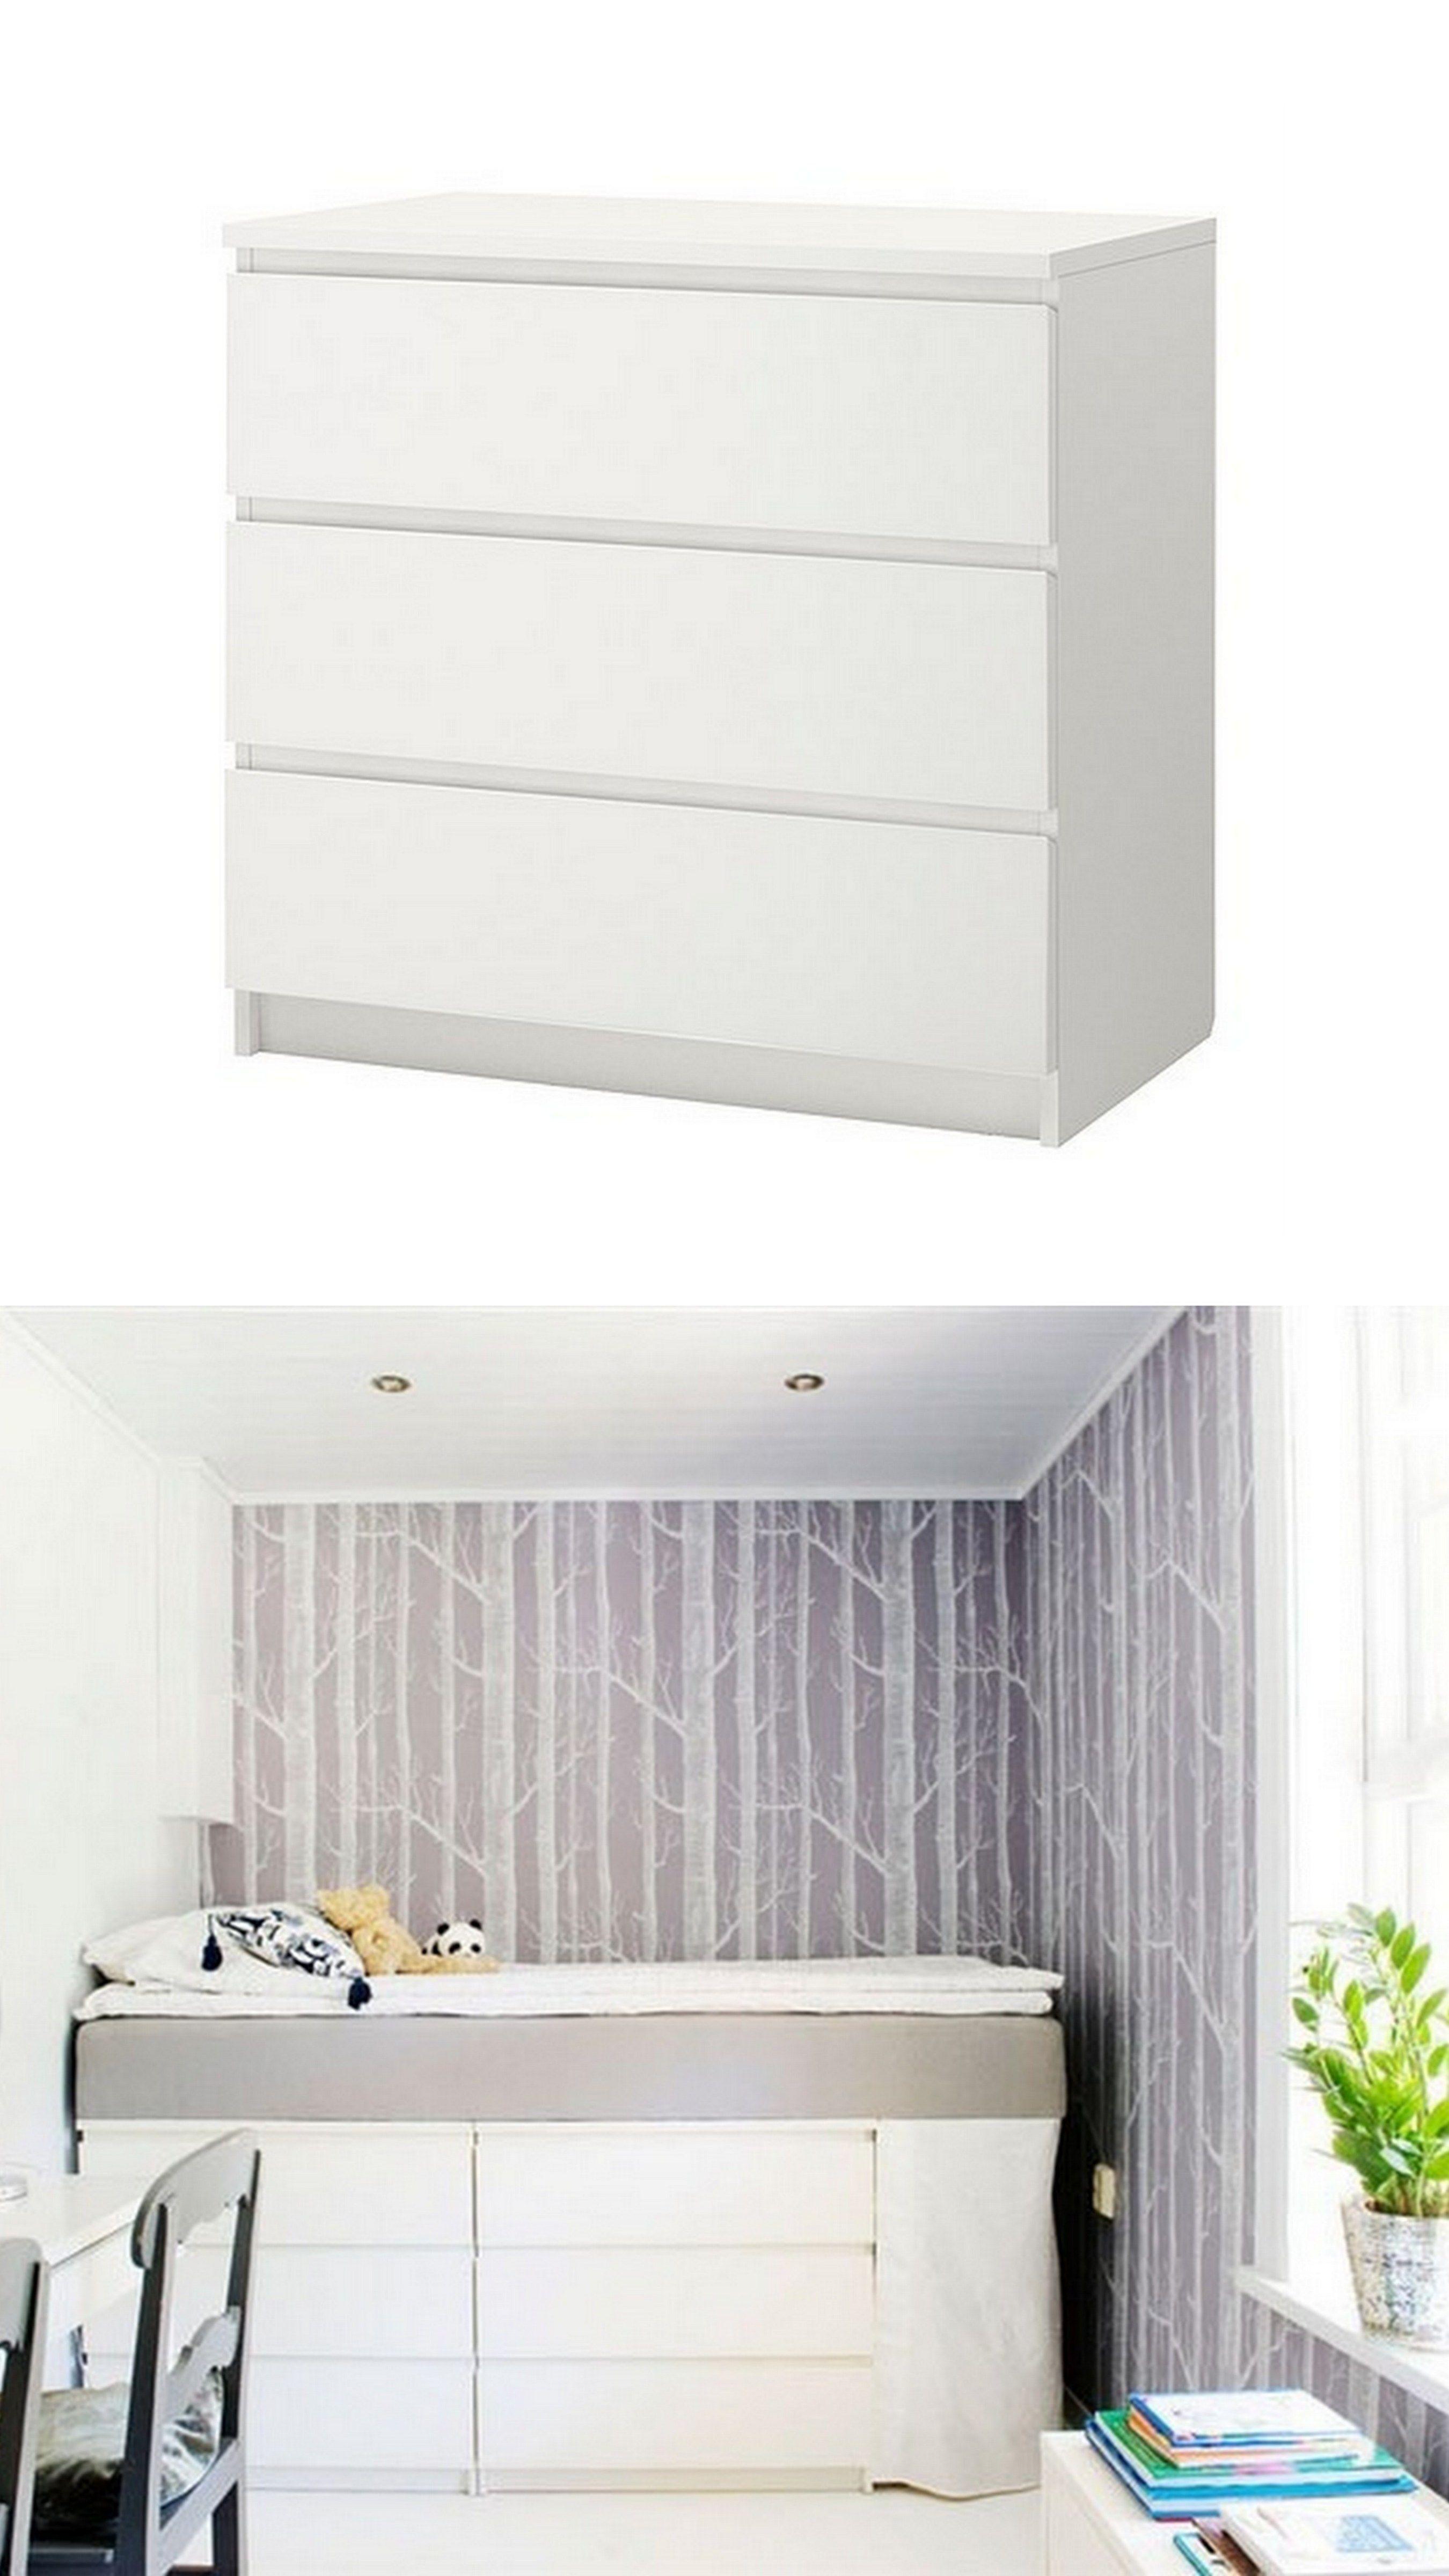 10 Totally Ingenious, Ridiculously Stylish IKEA Hacks